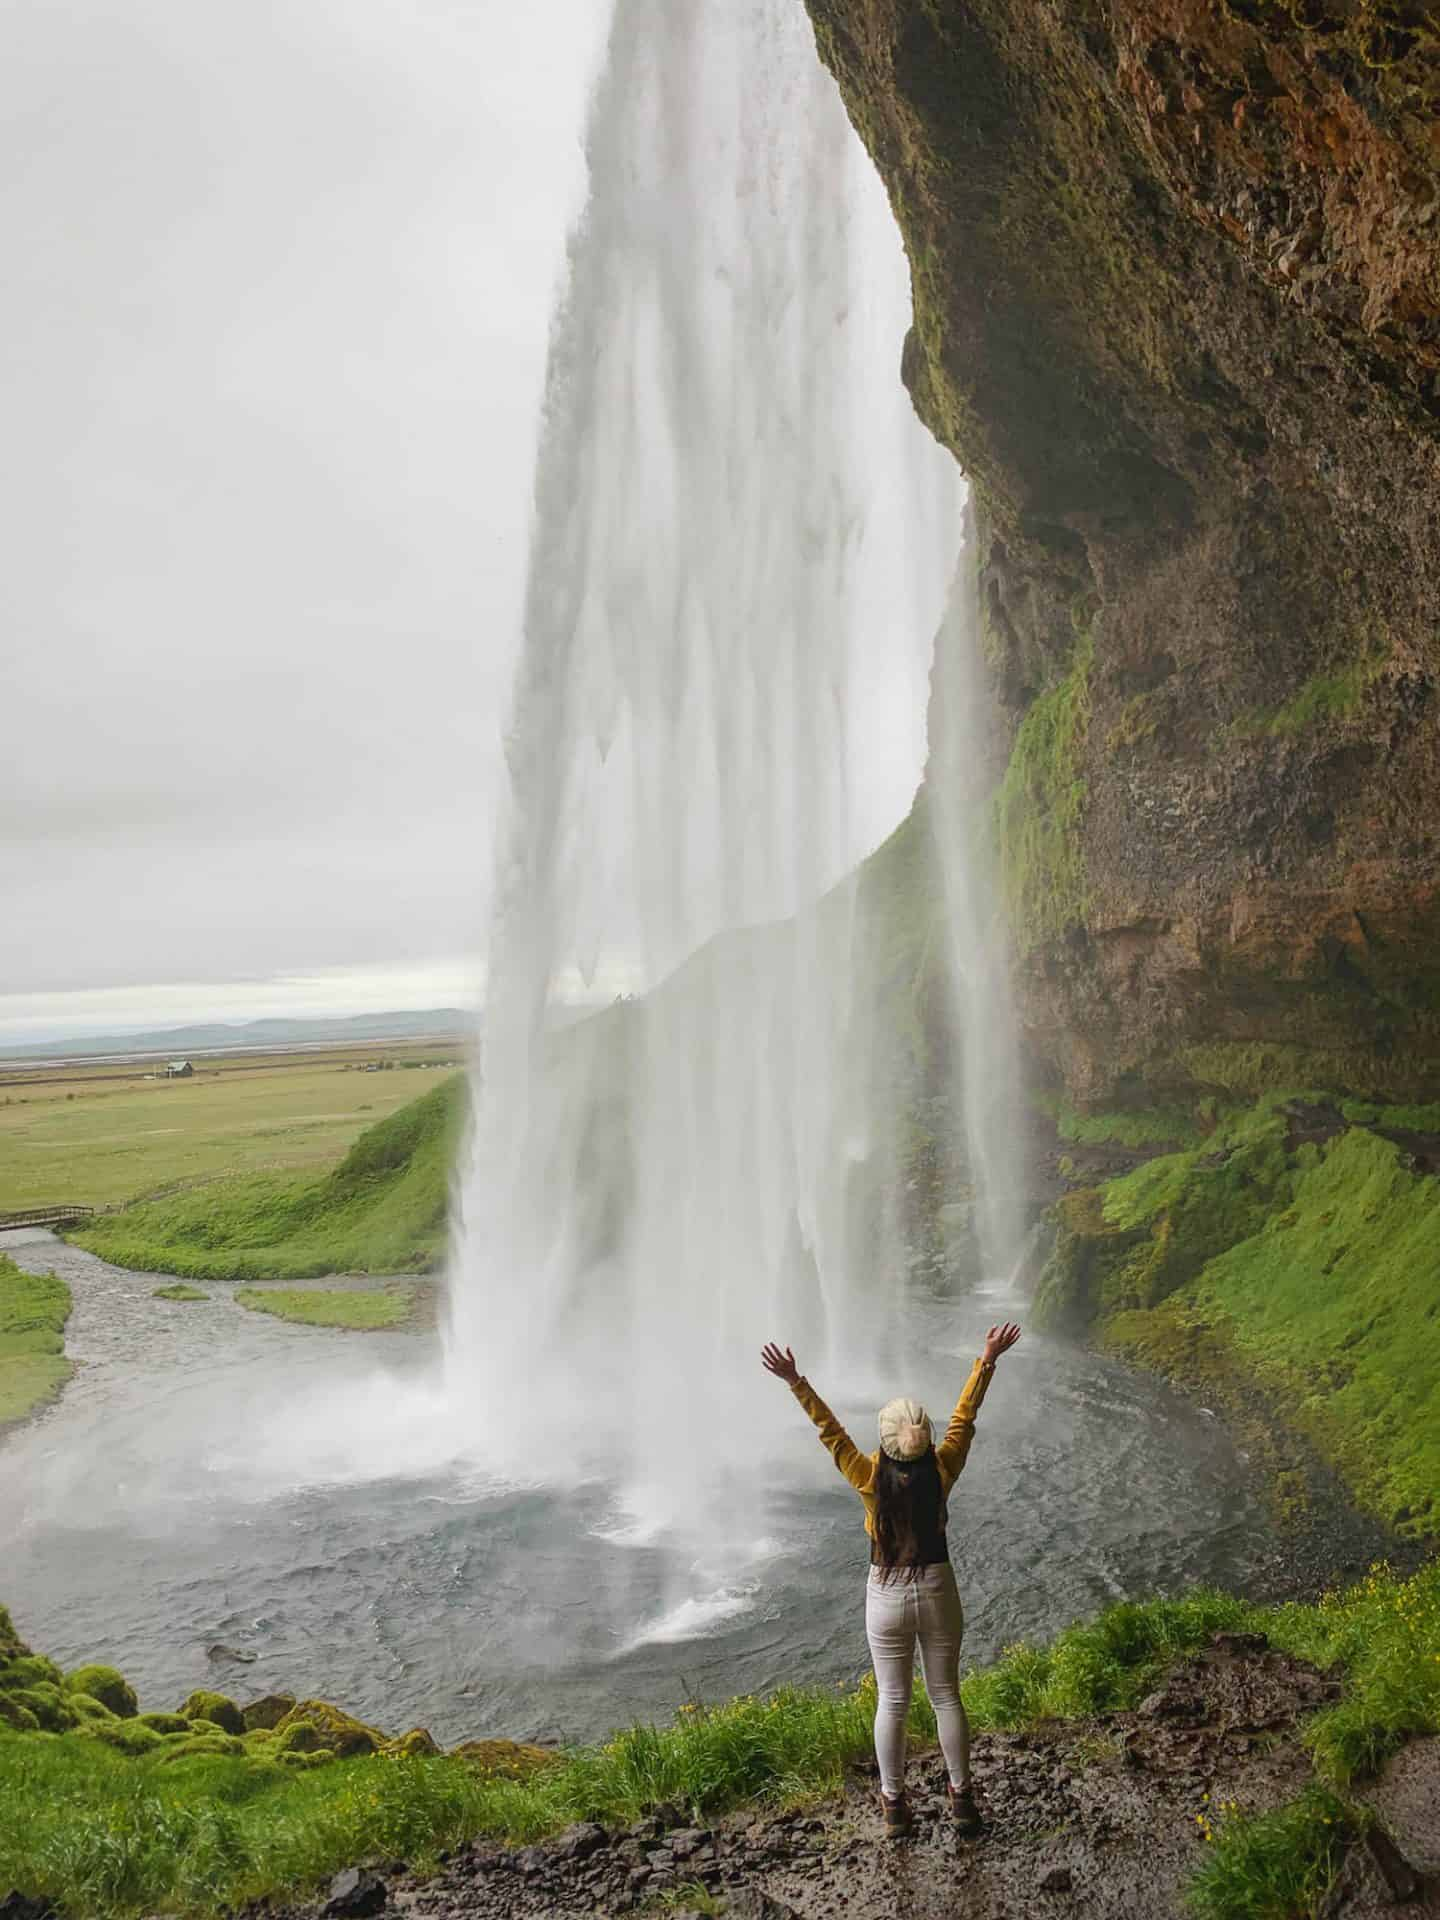 Seljalandsfoss Waterfall along the Iceland Ring Road